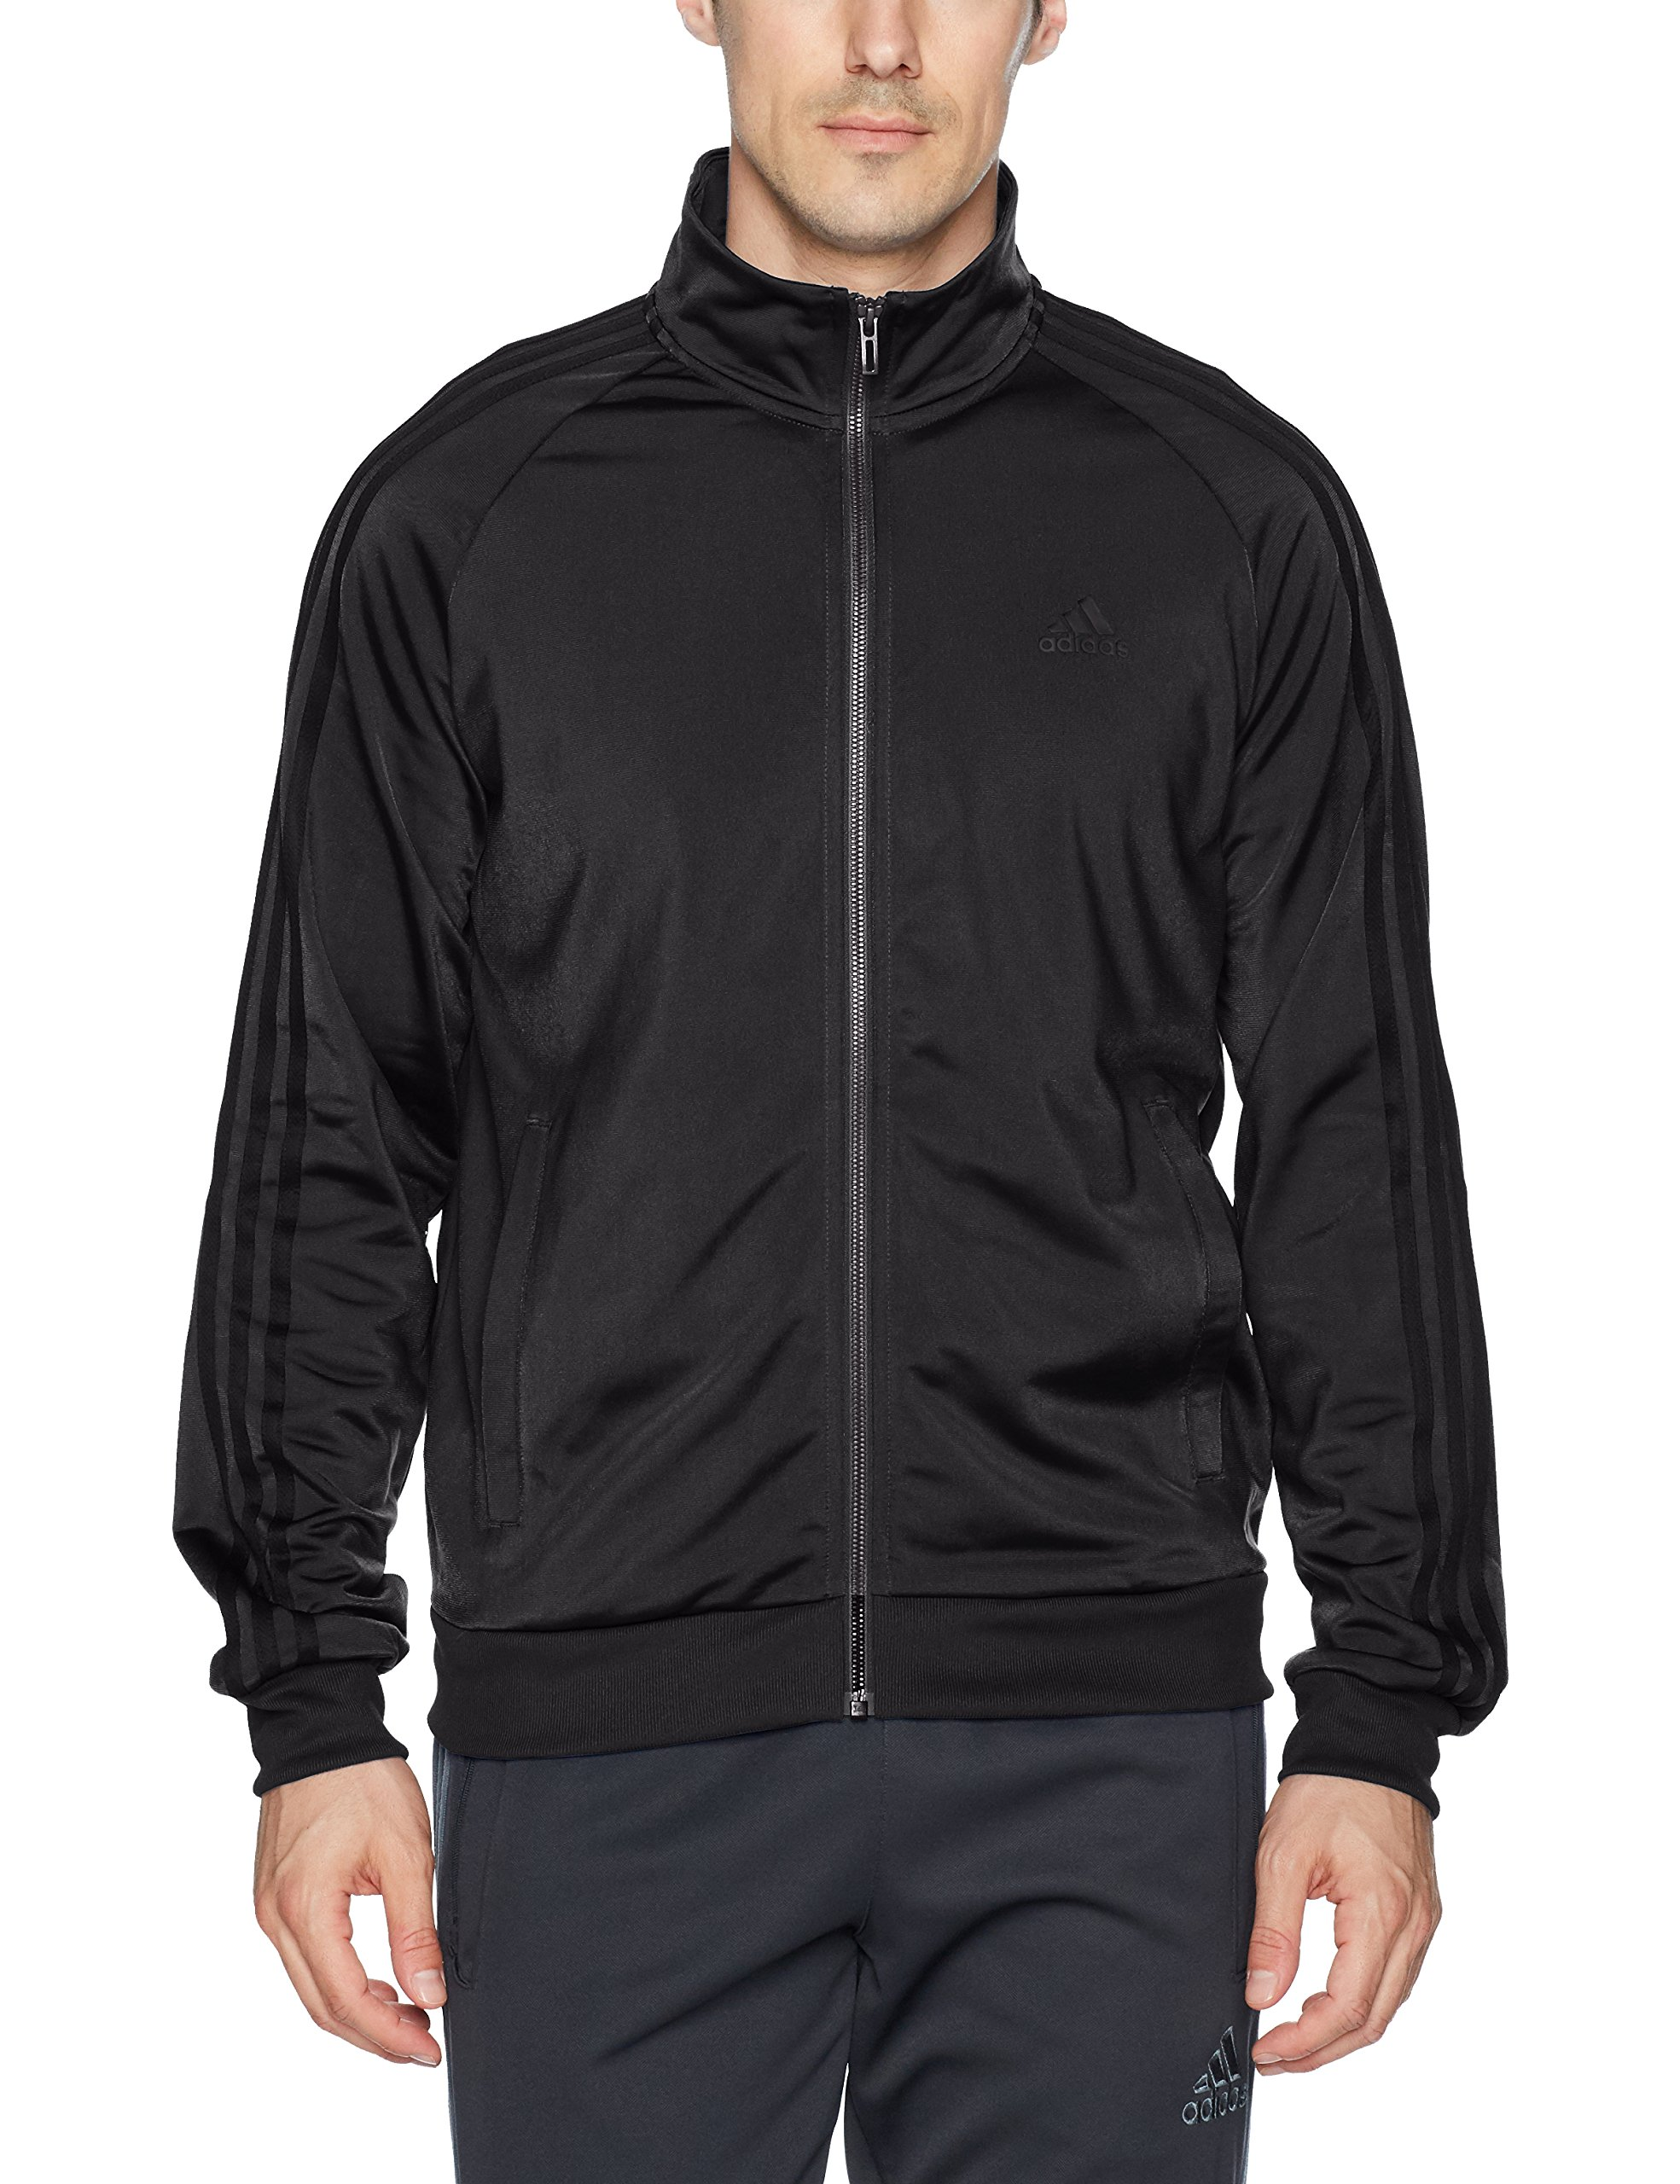 adidas Men's Essentials 3-Stripe Tricot Track Jacket, Black/Black, XX-Large by adidas